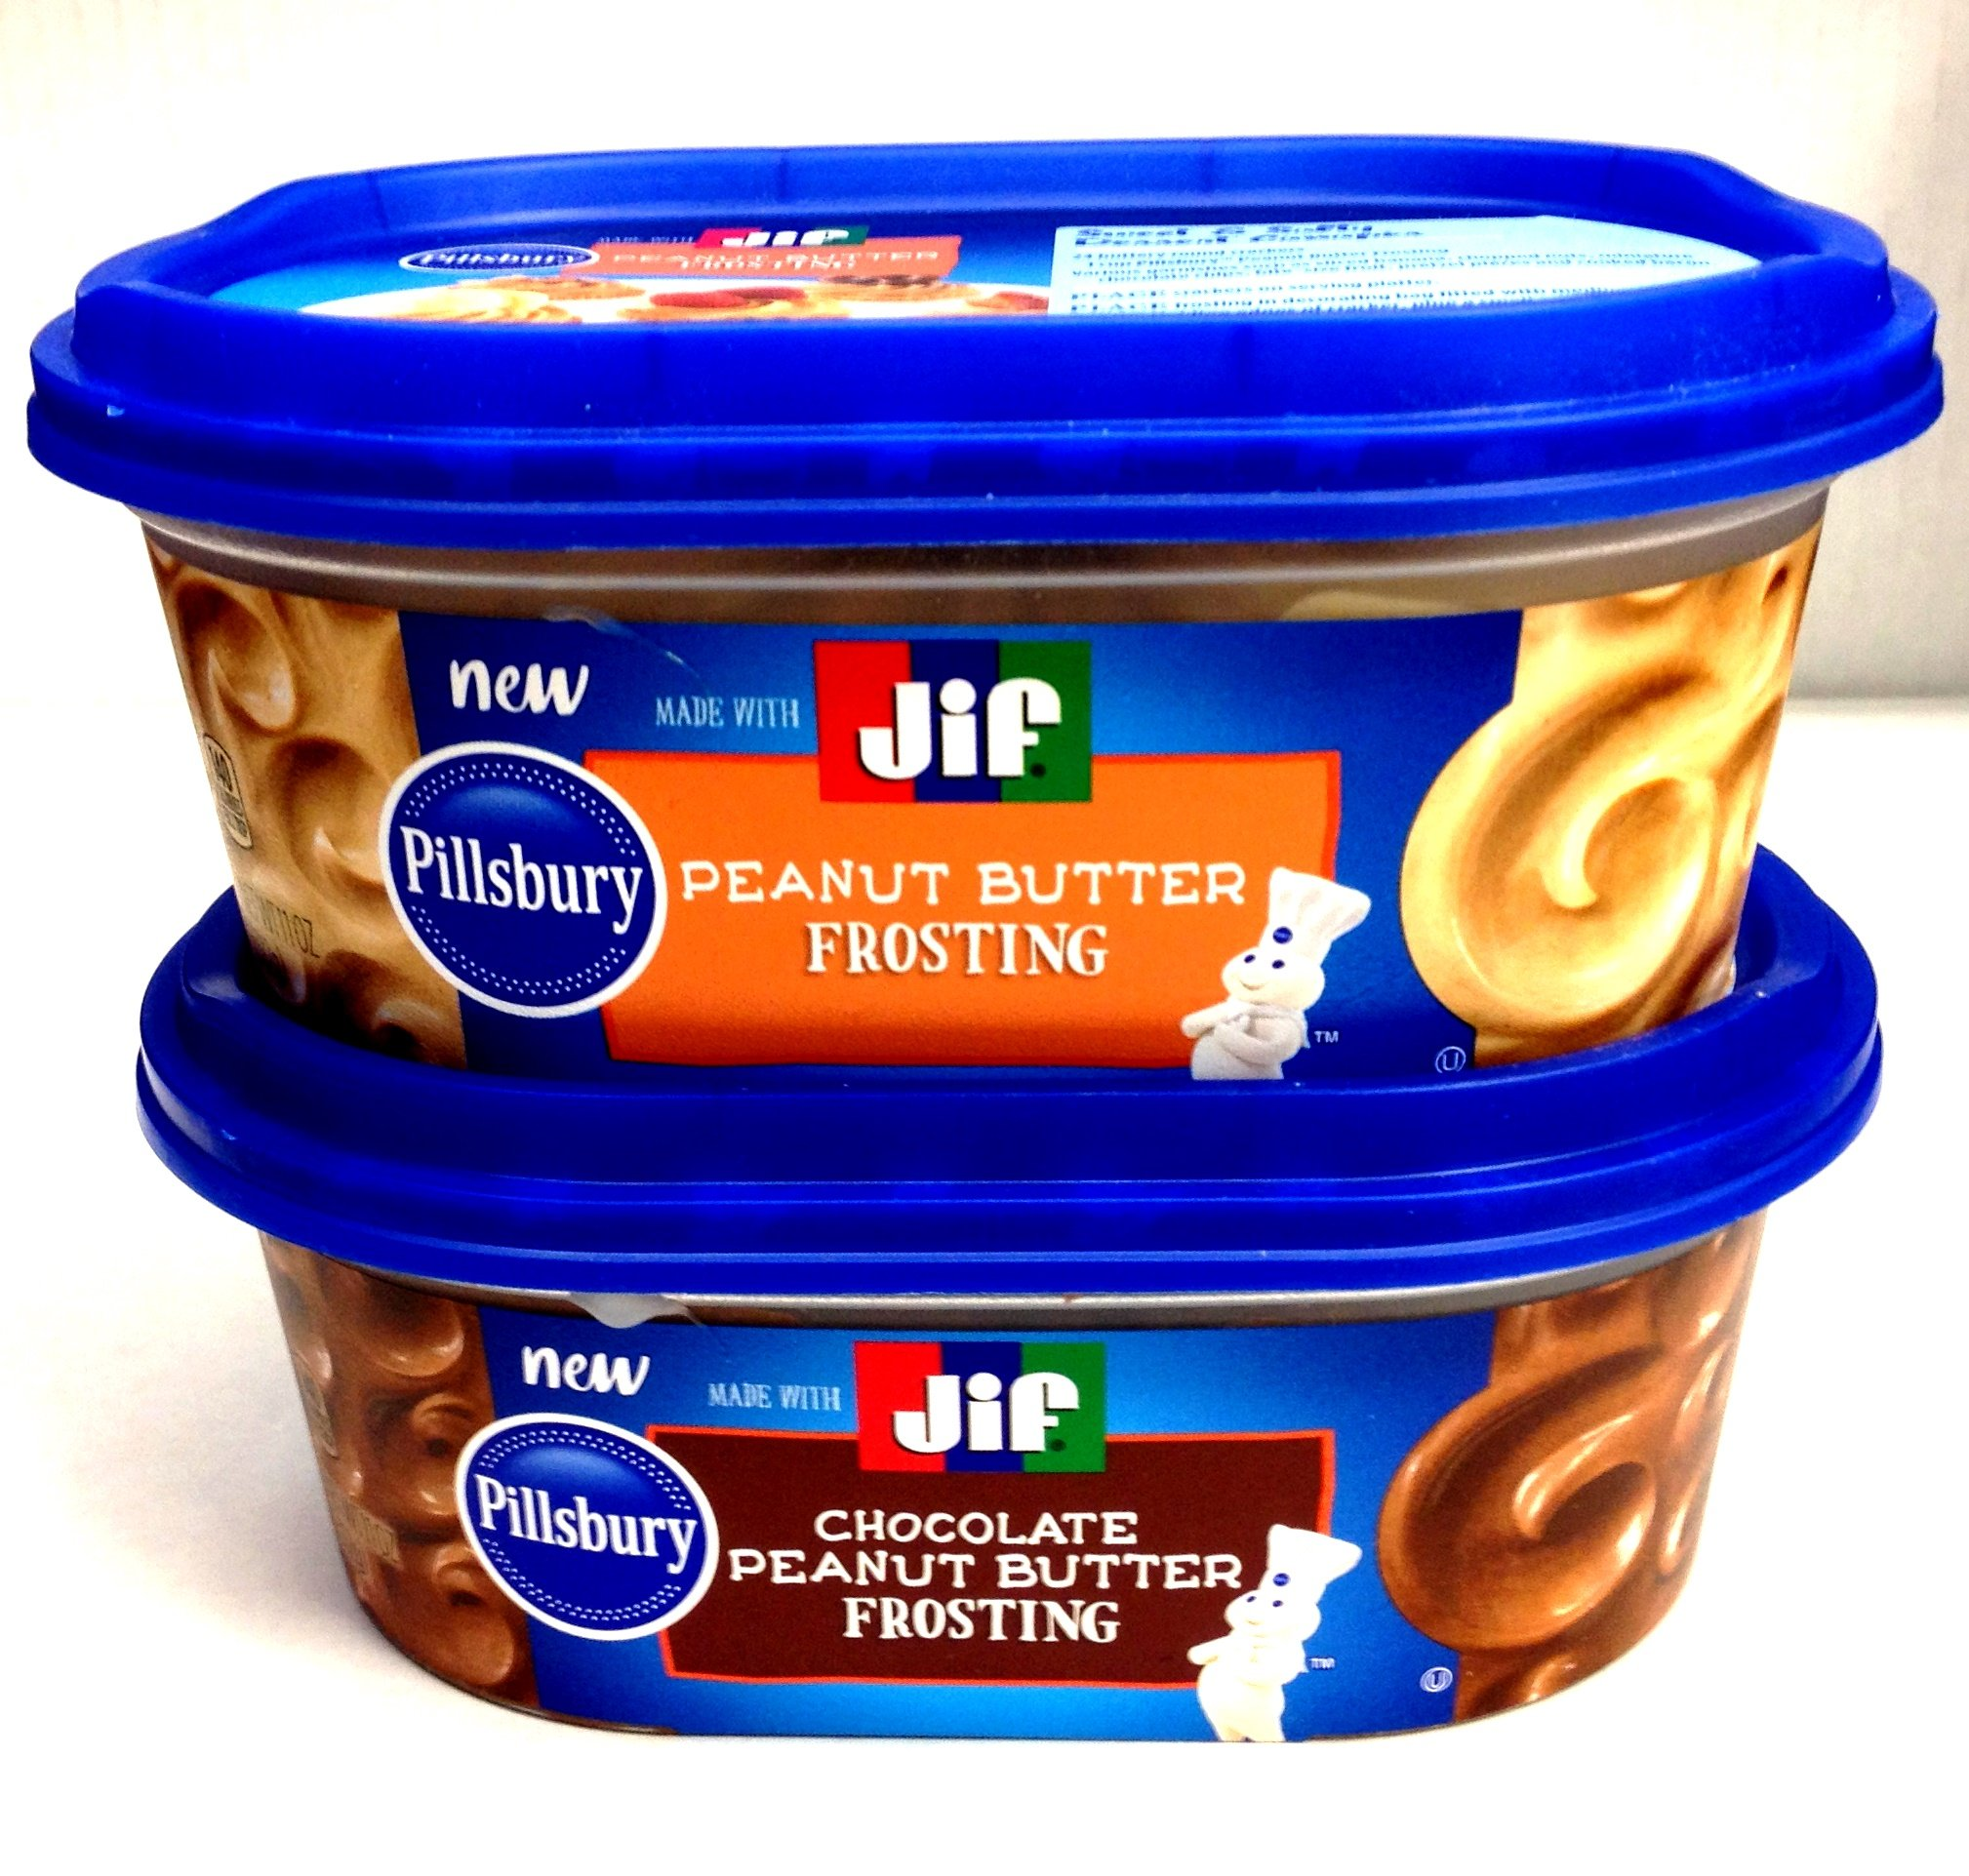 Pillsbury-Jif PEANUT BUTTER FROSTING Variety 4-Pack, 2 containers each of: PEANUT BUTTER FROSTING; CHOCOLATE PEANUT BUTTER FROSTING + BONUS Set of Heavy Duty Plastic Utensils by Pillsbury